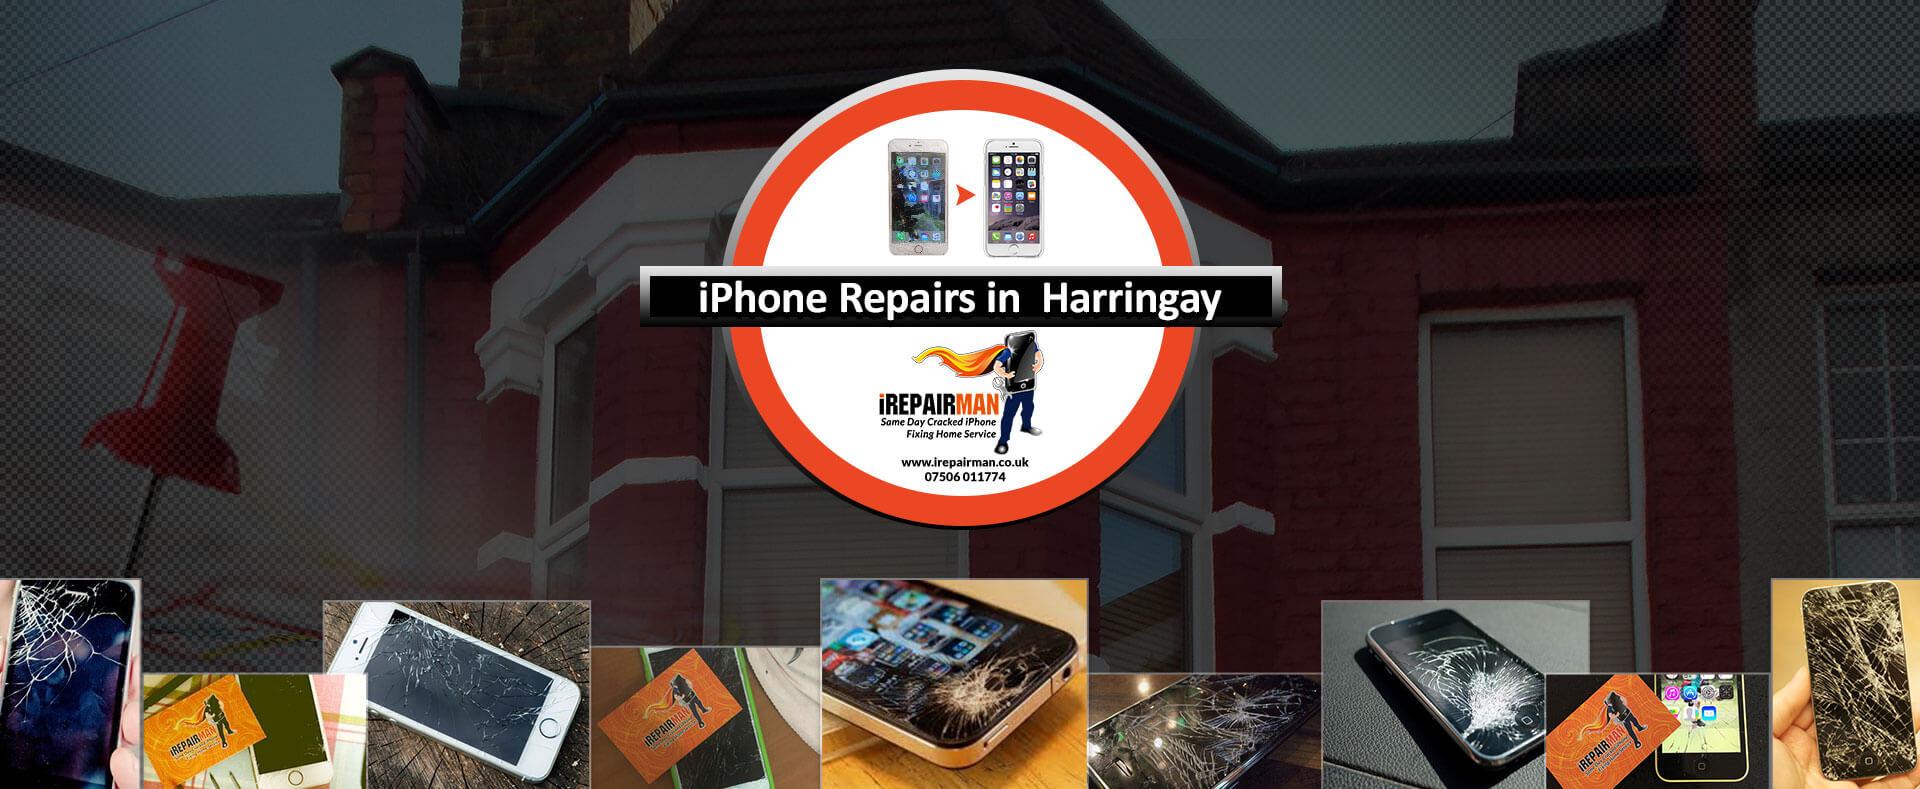 iPhone Repairs in Harringay